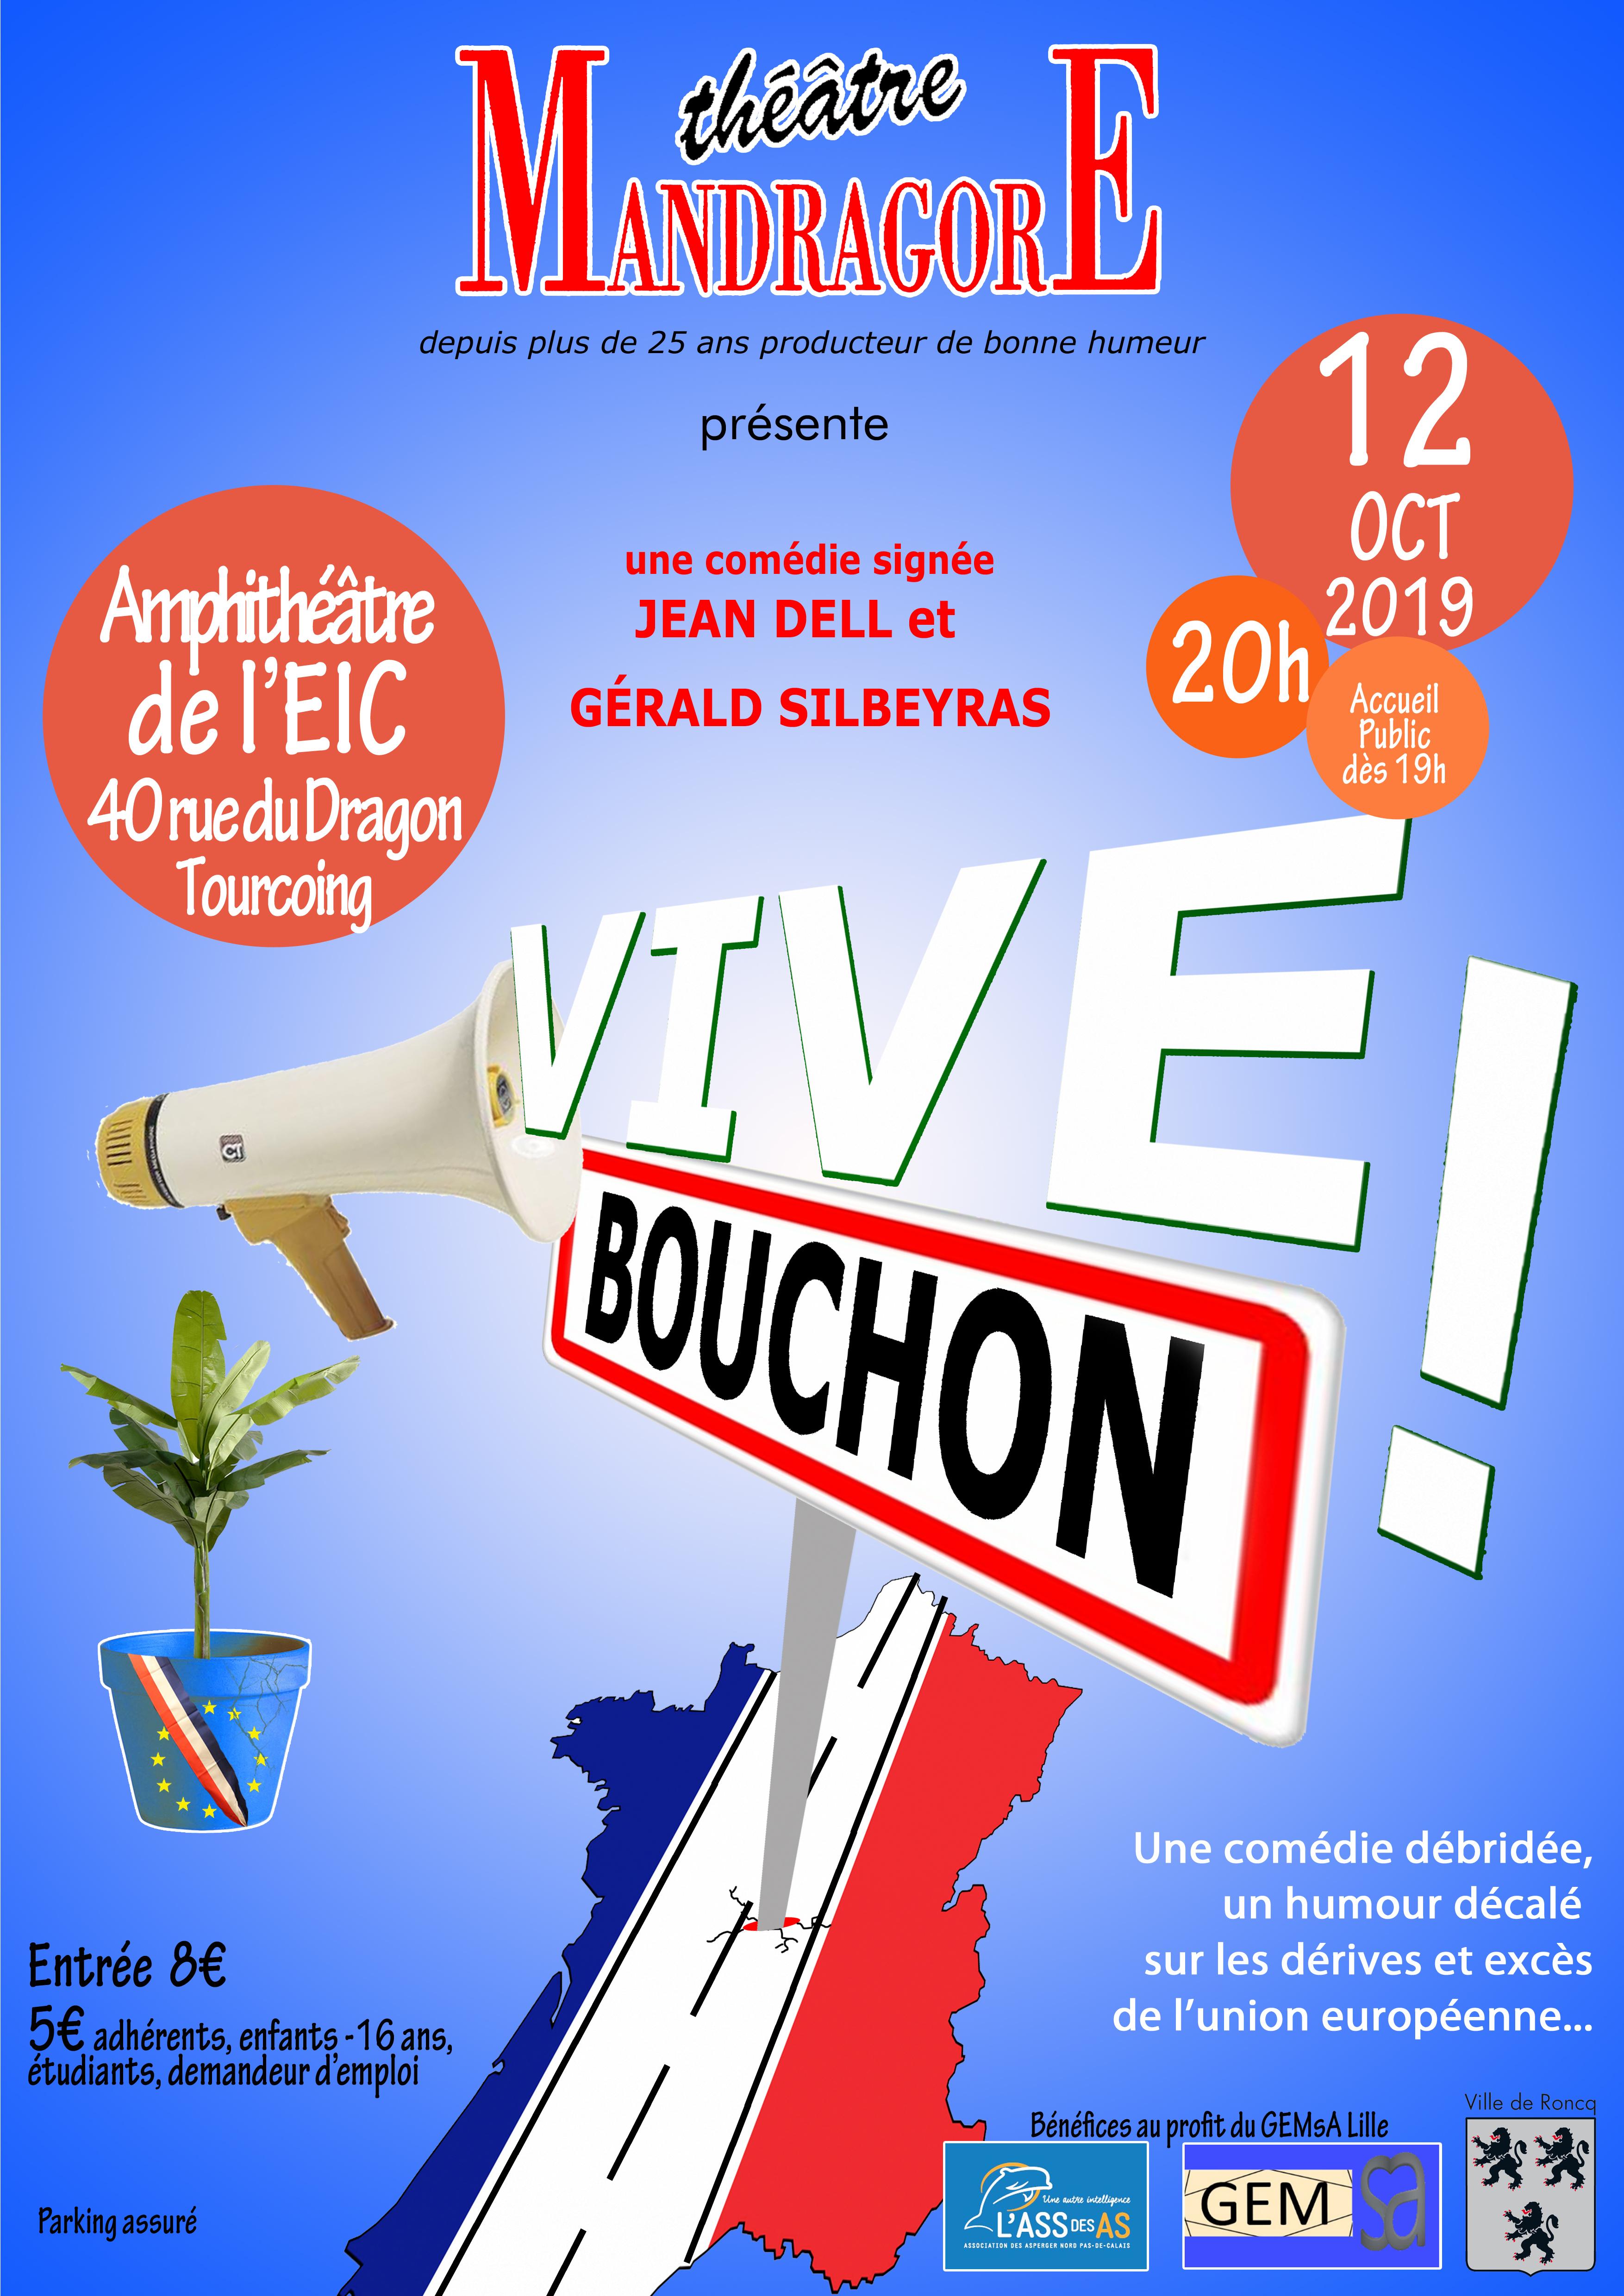 vive-bouchon-EIC-1 (2)